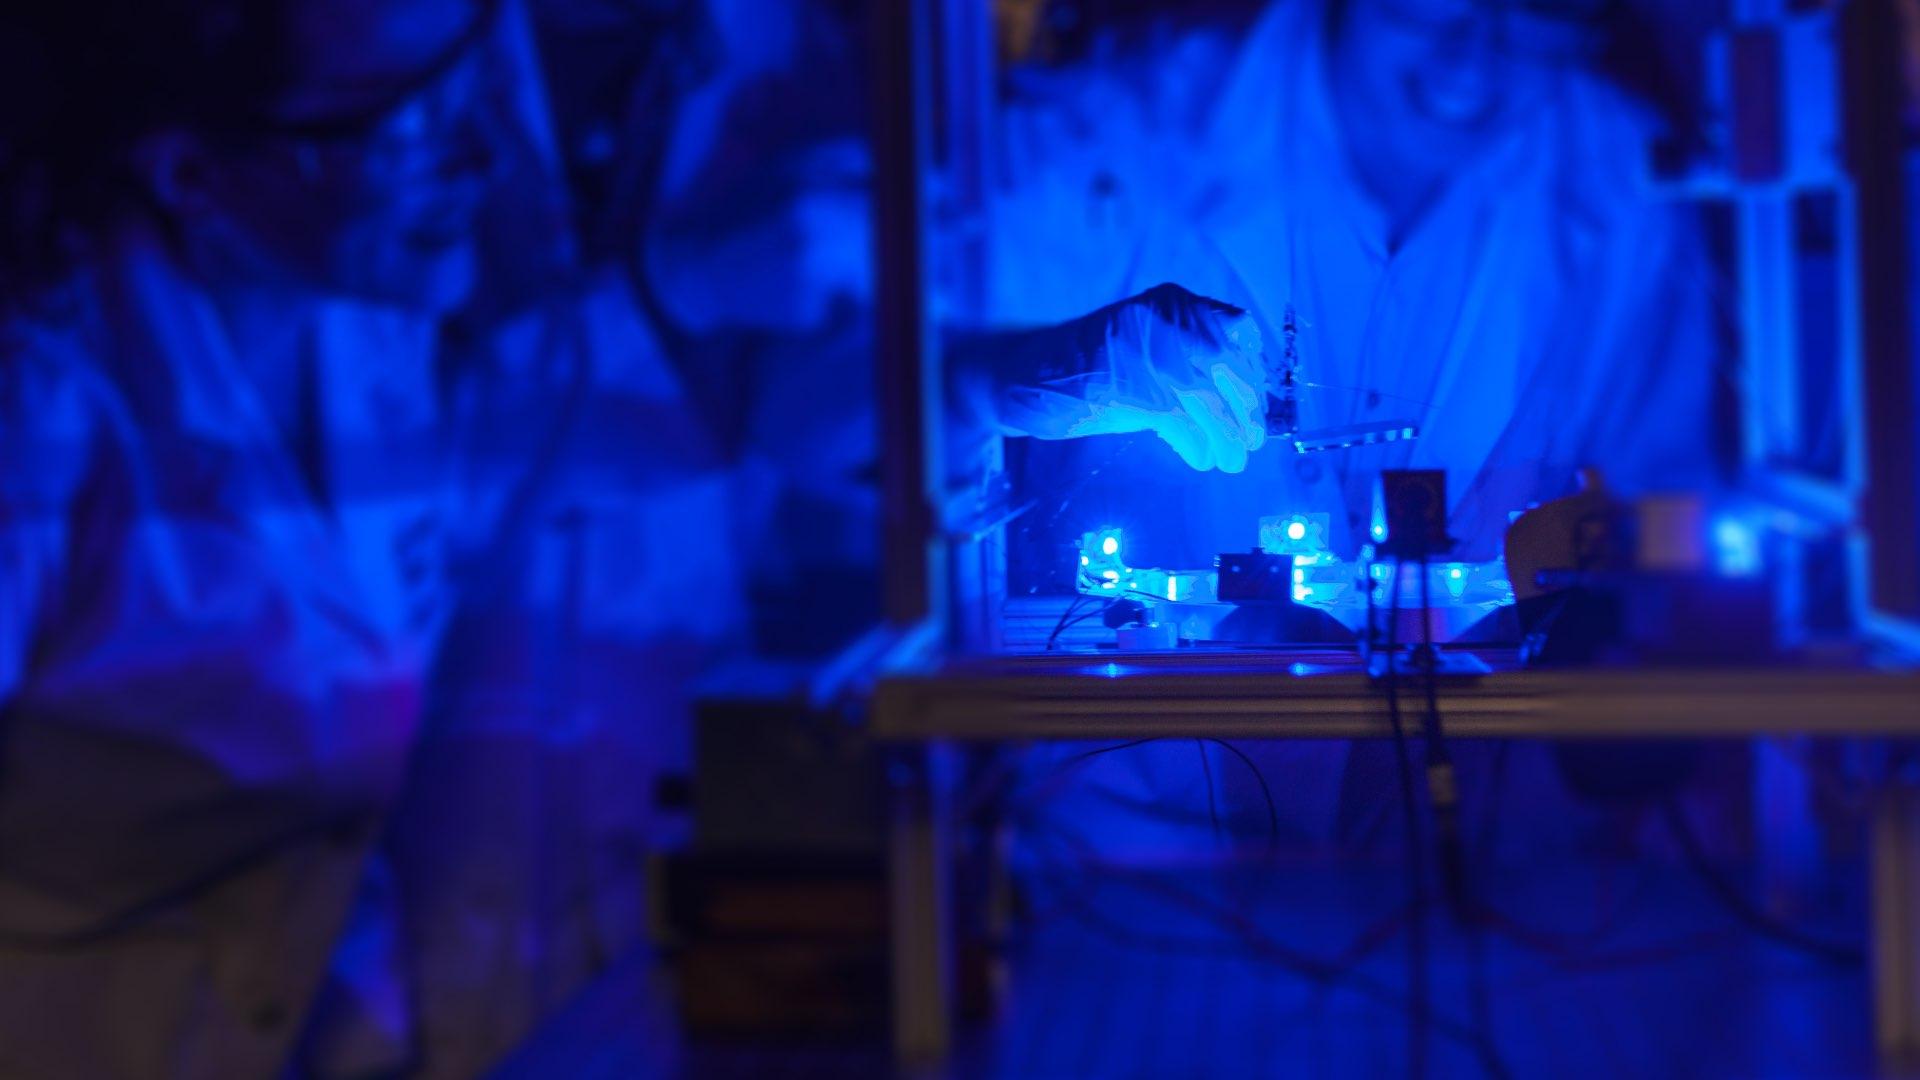 Lab experiment, Harvey Mudd College